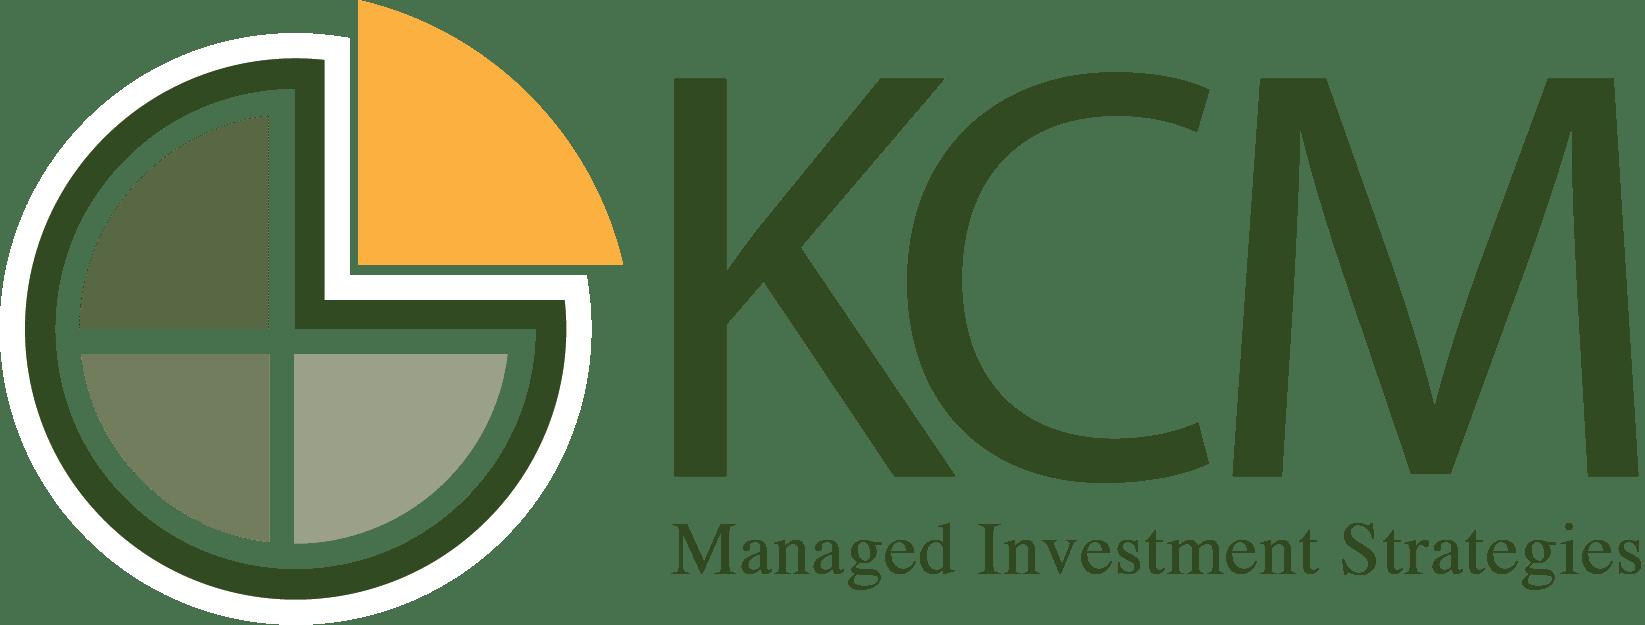 Kcm Investment